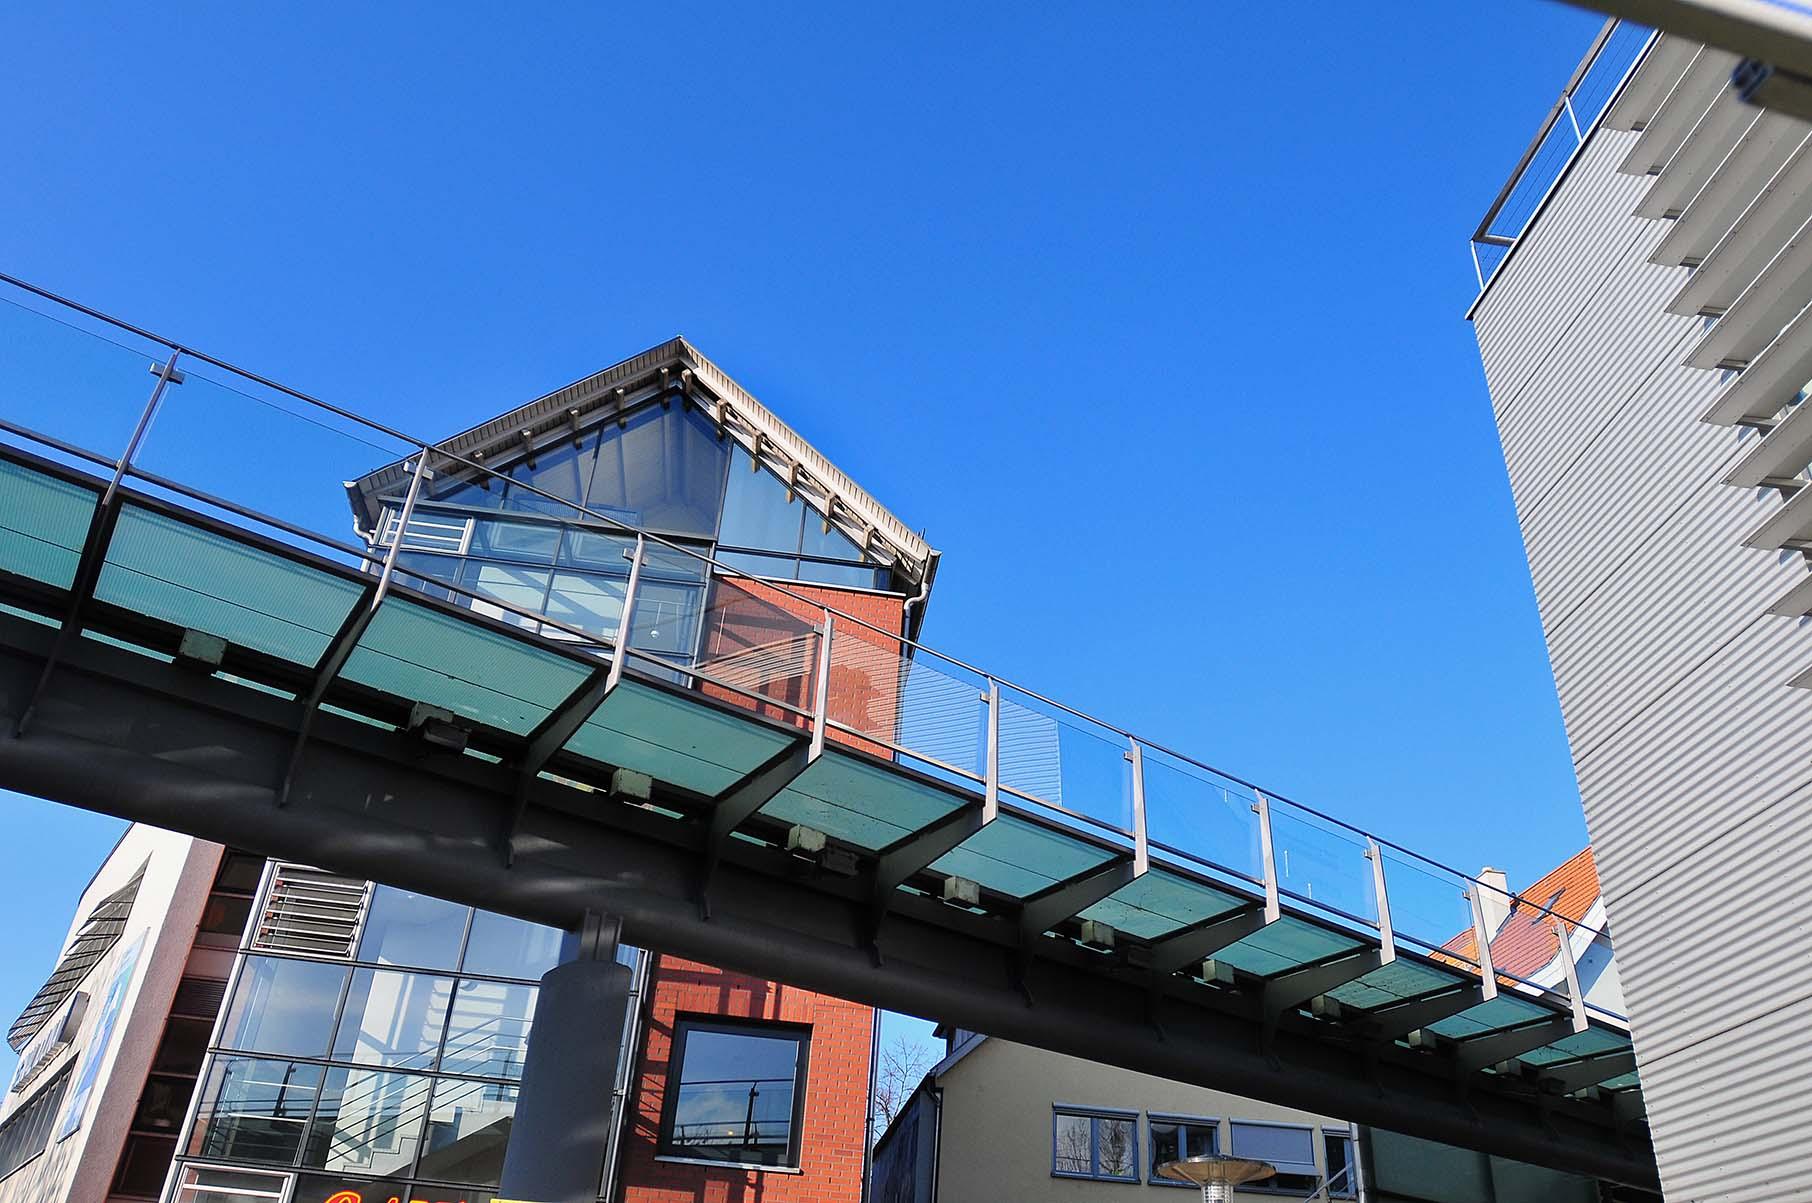 Architektur portfolio trinkhaus fotografie for Portfolio architektur